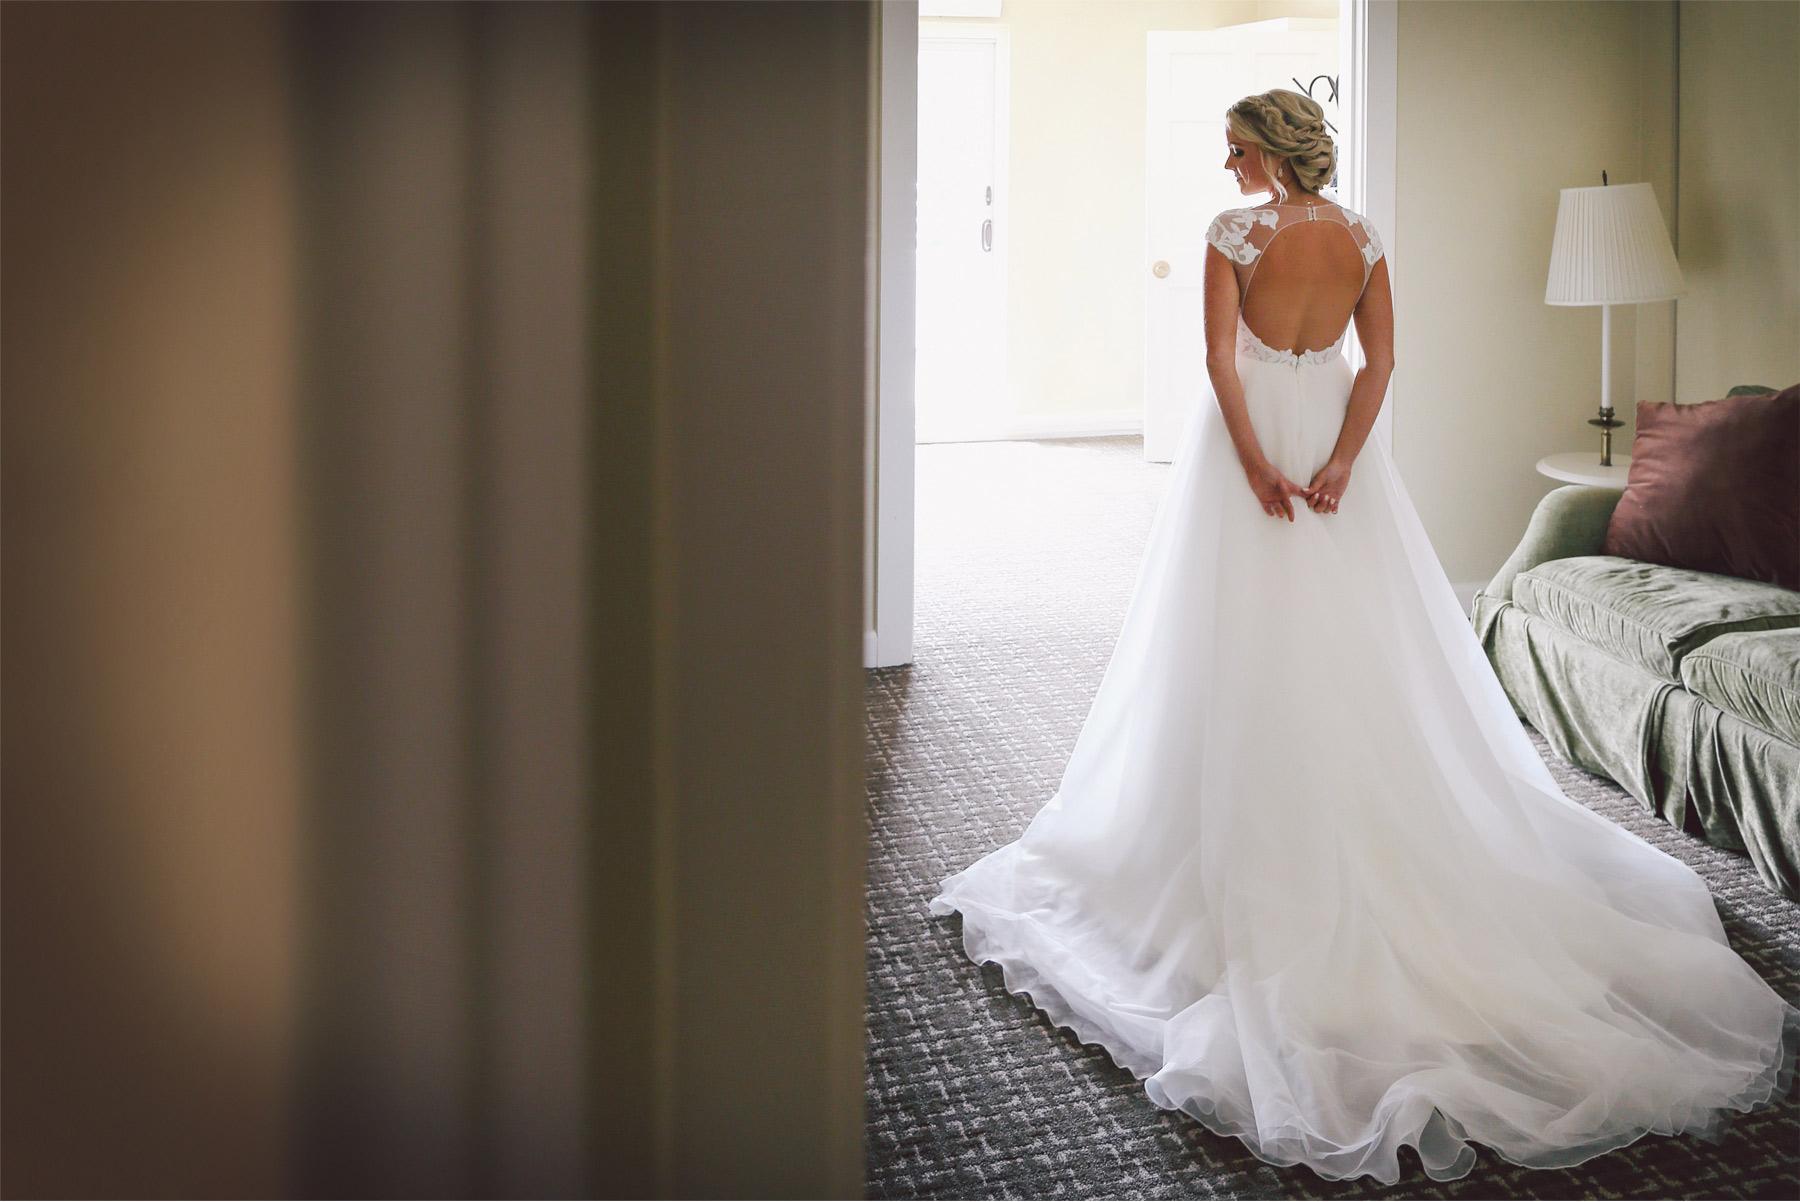 01-Minnetonka-Minnesota-Wedding-Photography-by-Vick-Photography-Wedding-Dress-Morning-Getting-Ready-Jennifer-and-Adam.jpg